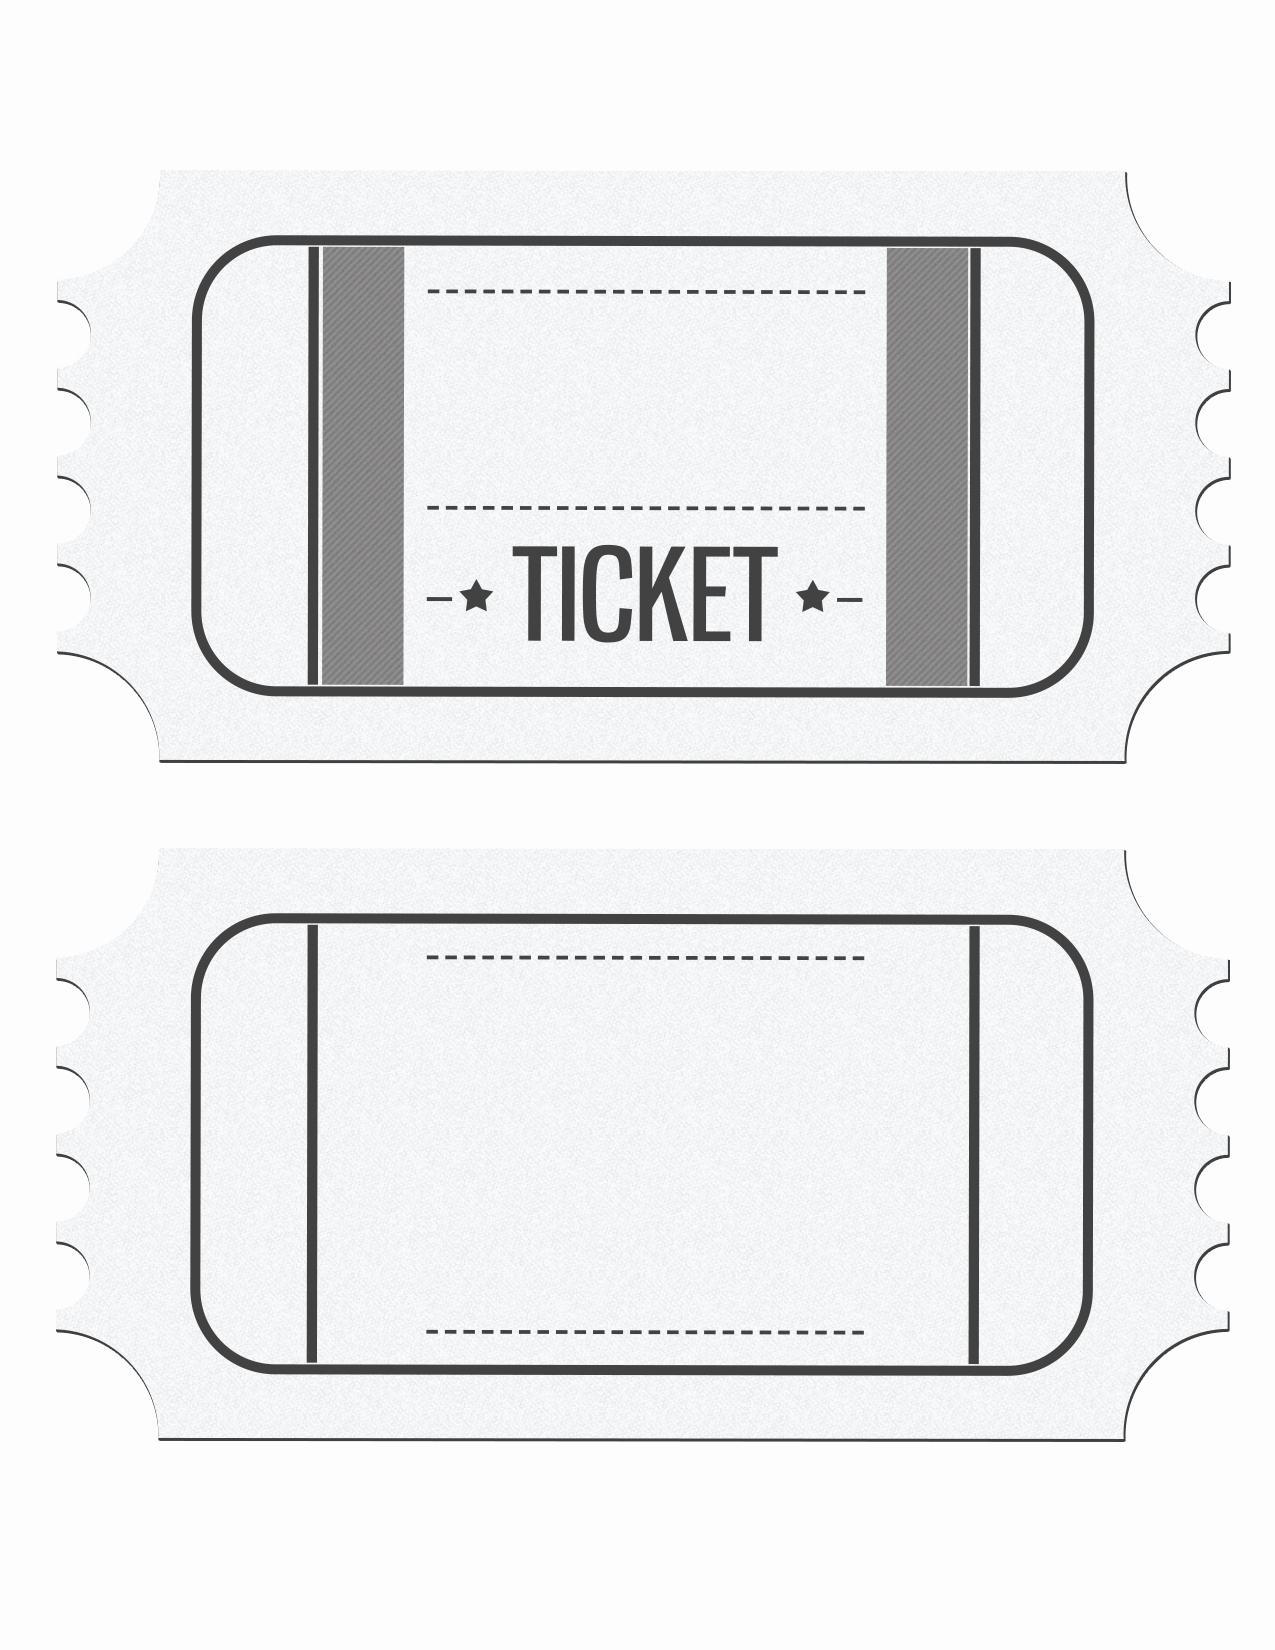 Blank Raffle Ticket Template Free Unique Raffle Tickets Template Word Bamboodownunder